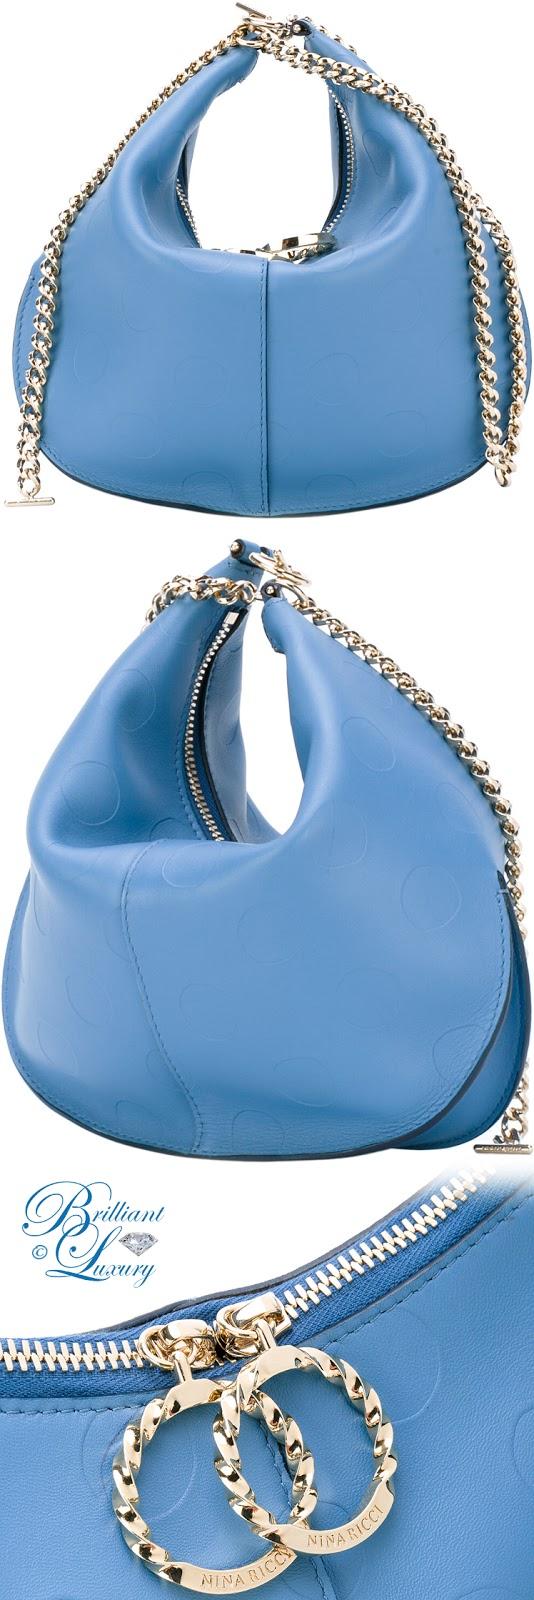 Brilliant Luxury ♦ Nina Ricci Chain Saddle Clutch